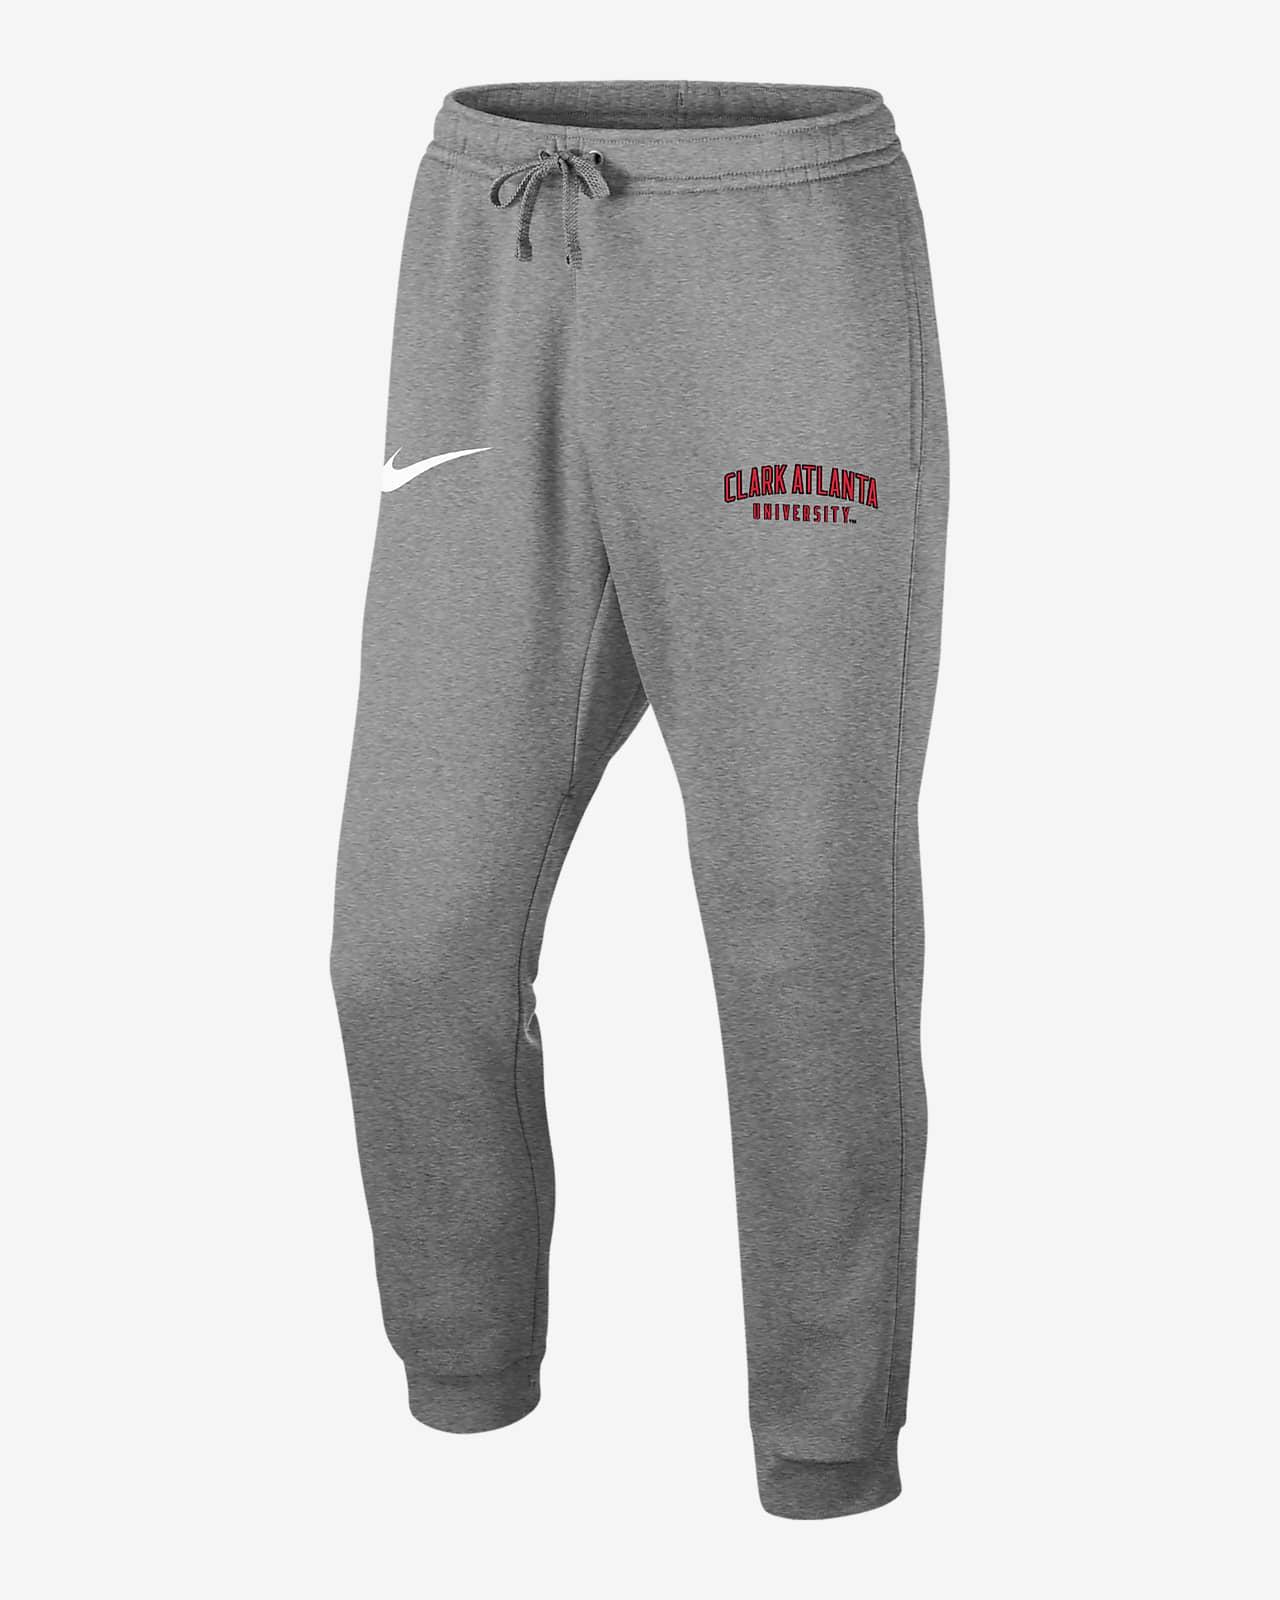 Nike College Club Fleece (Clark Atlanta) Joggers